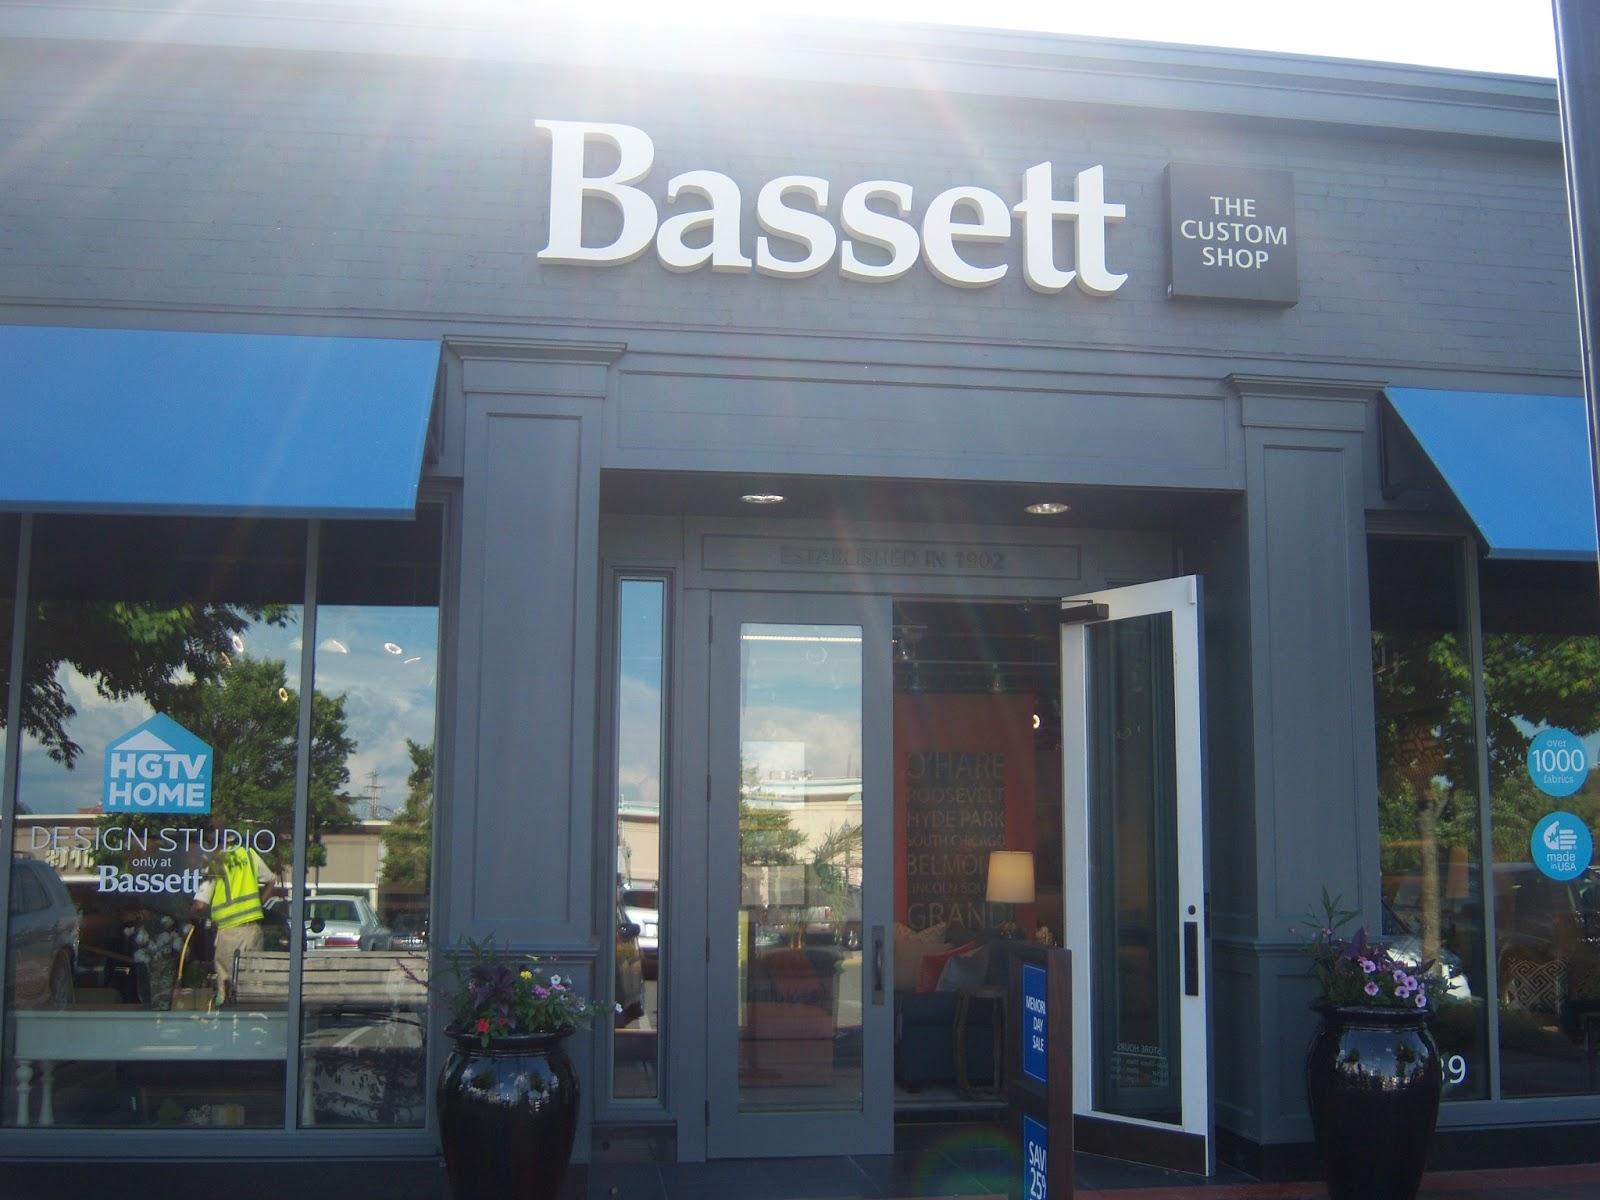 My Trip To The Bassett Custom Shop Raleigh Nc Fabellis